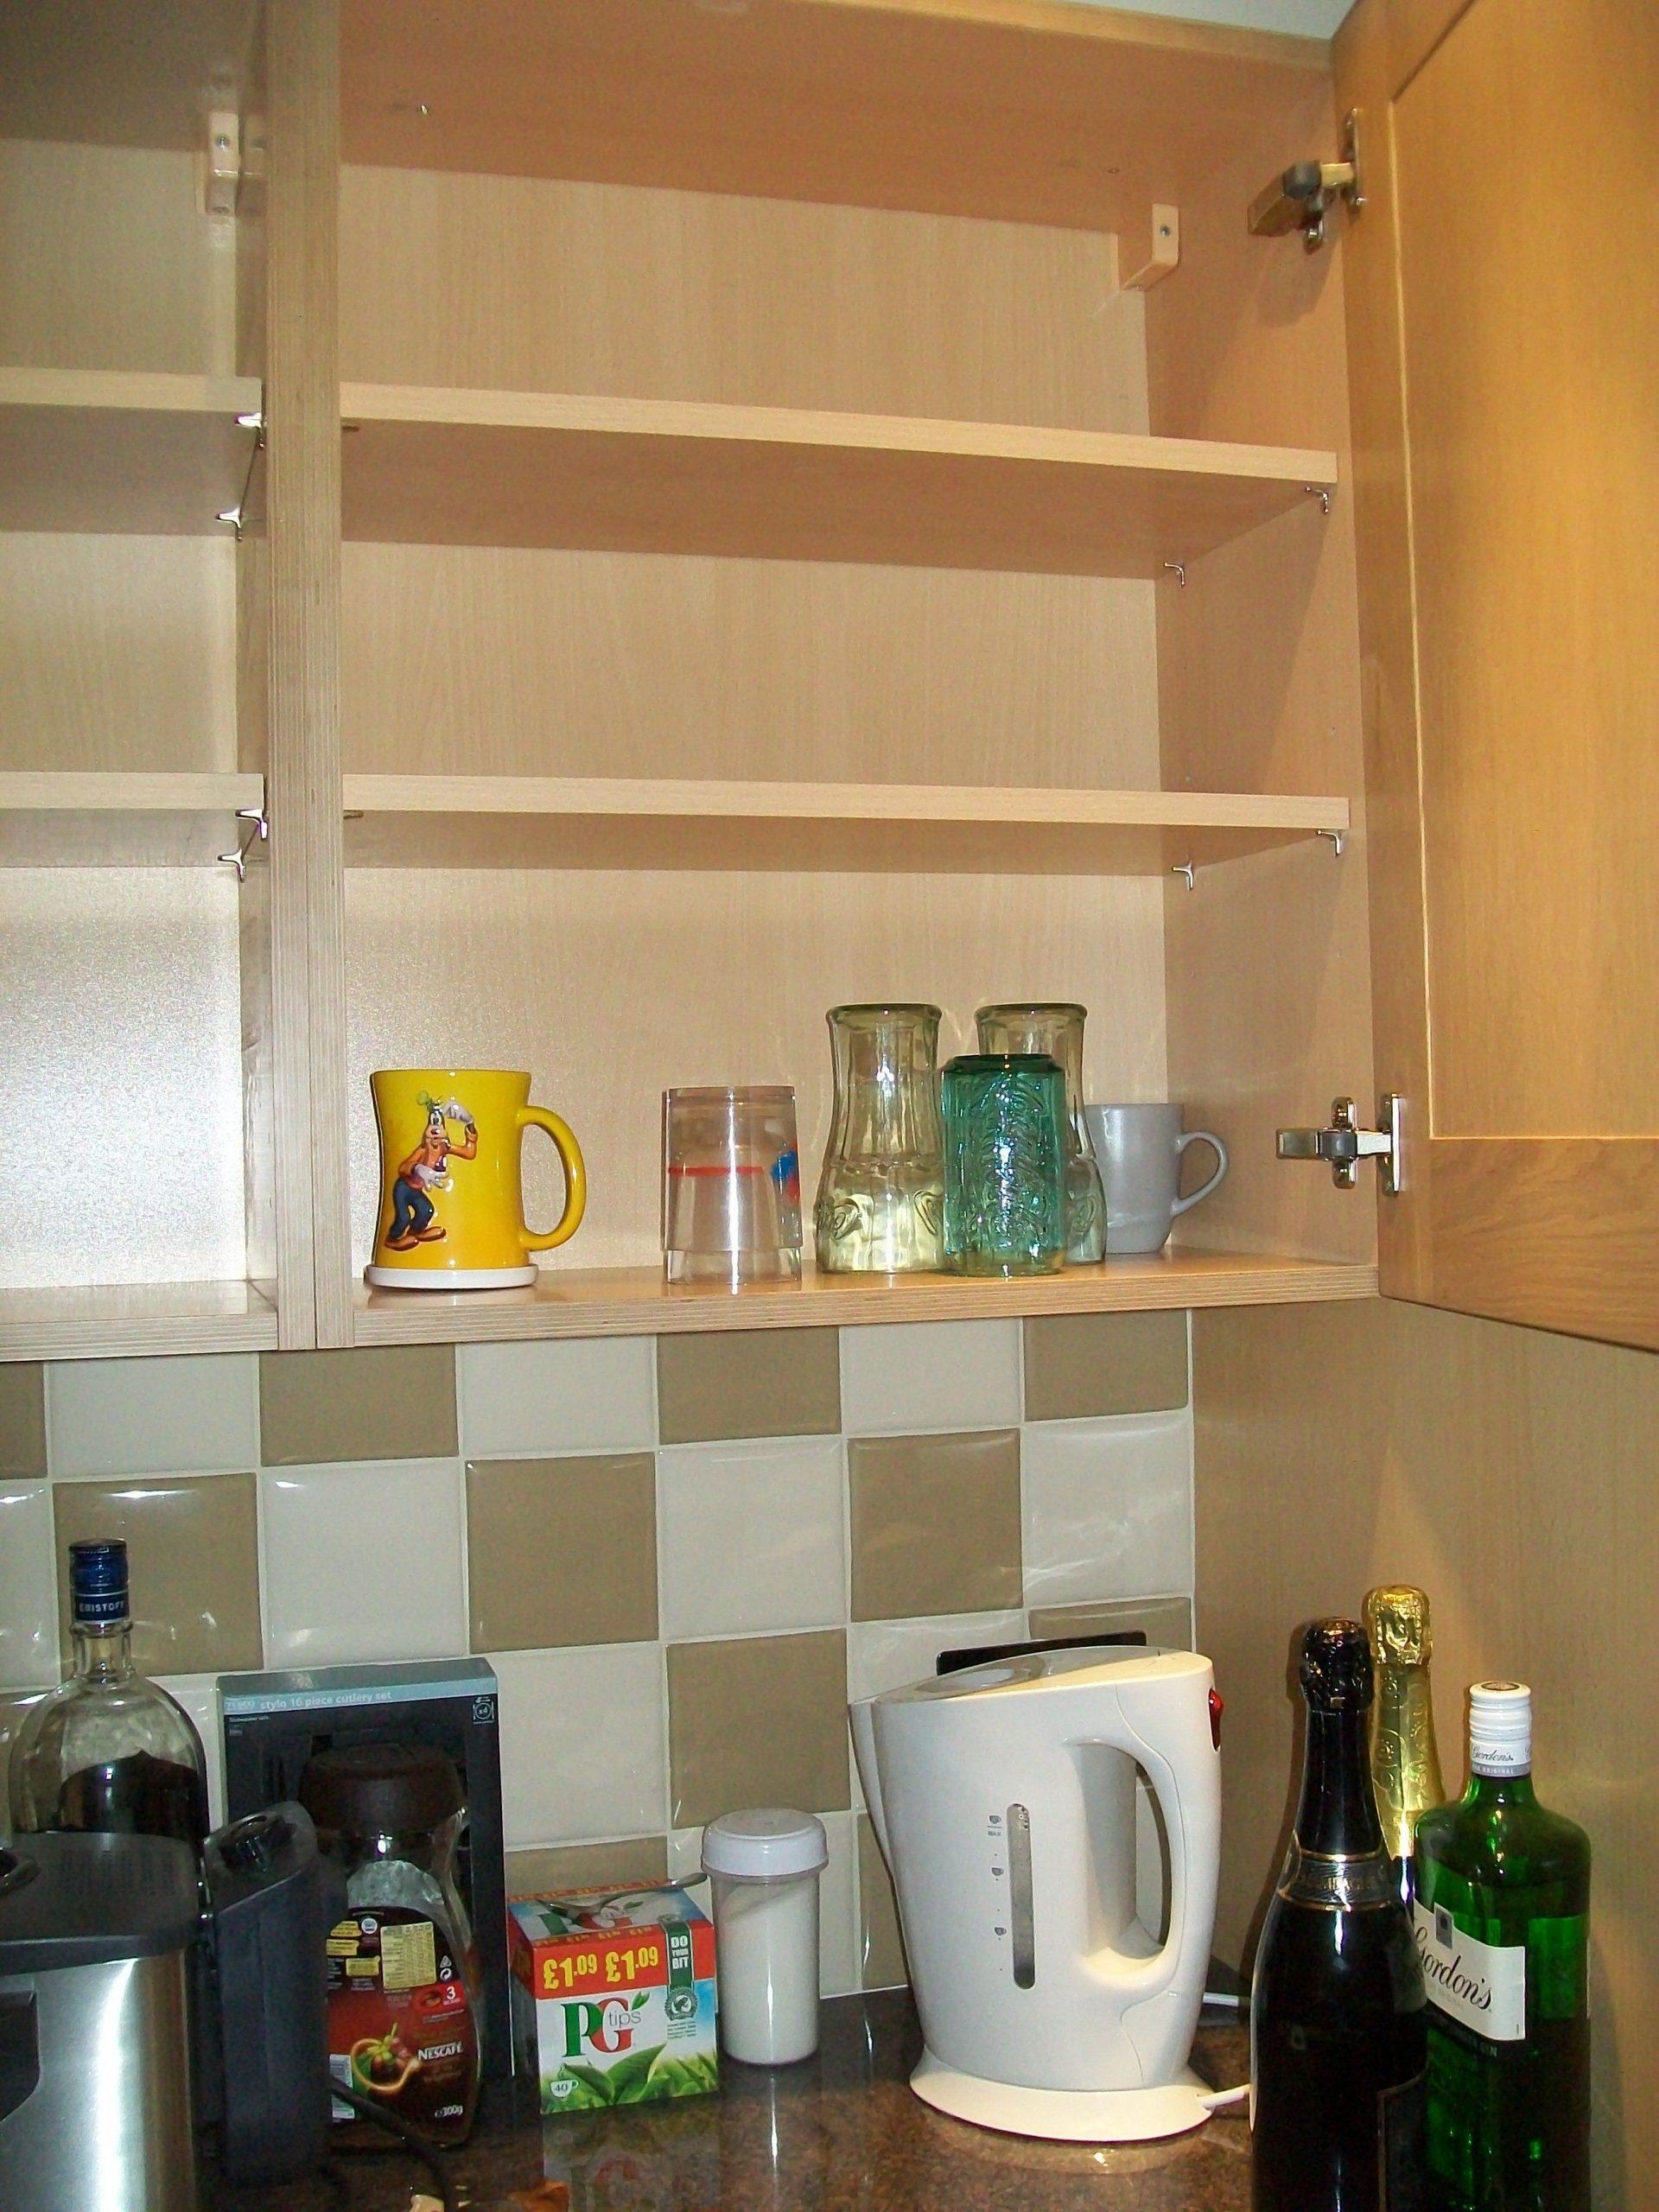 szafka w kuchni